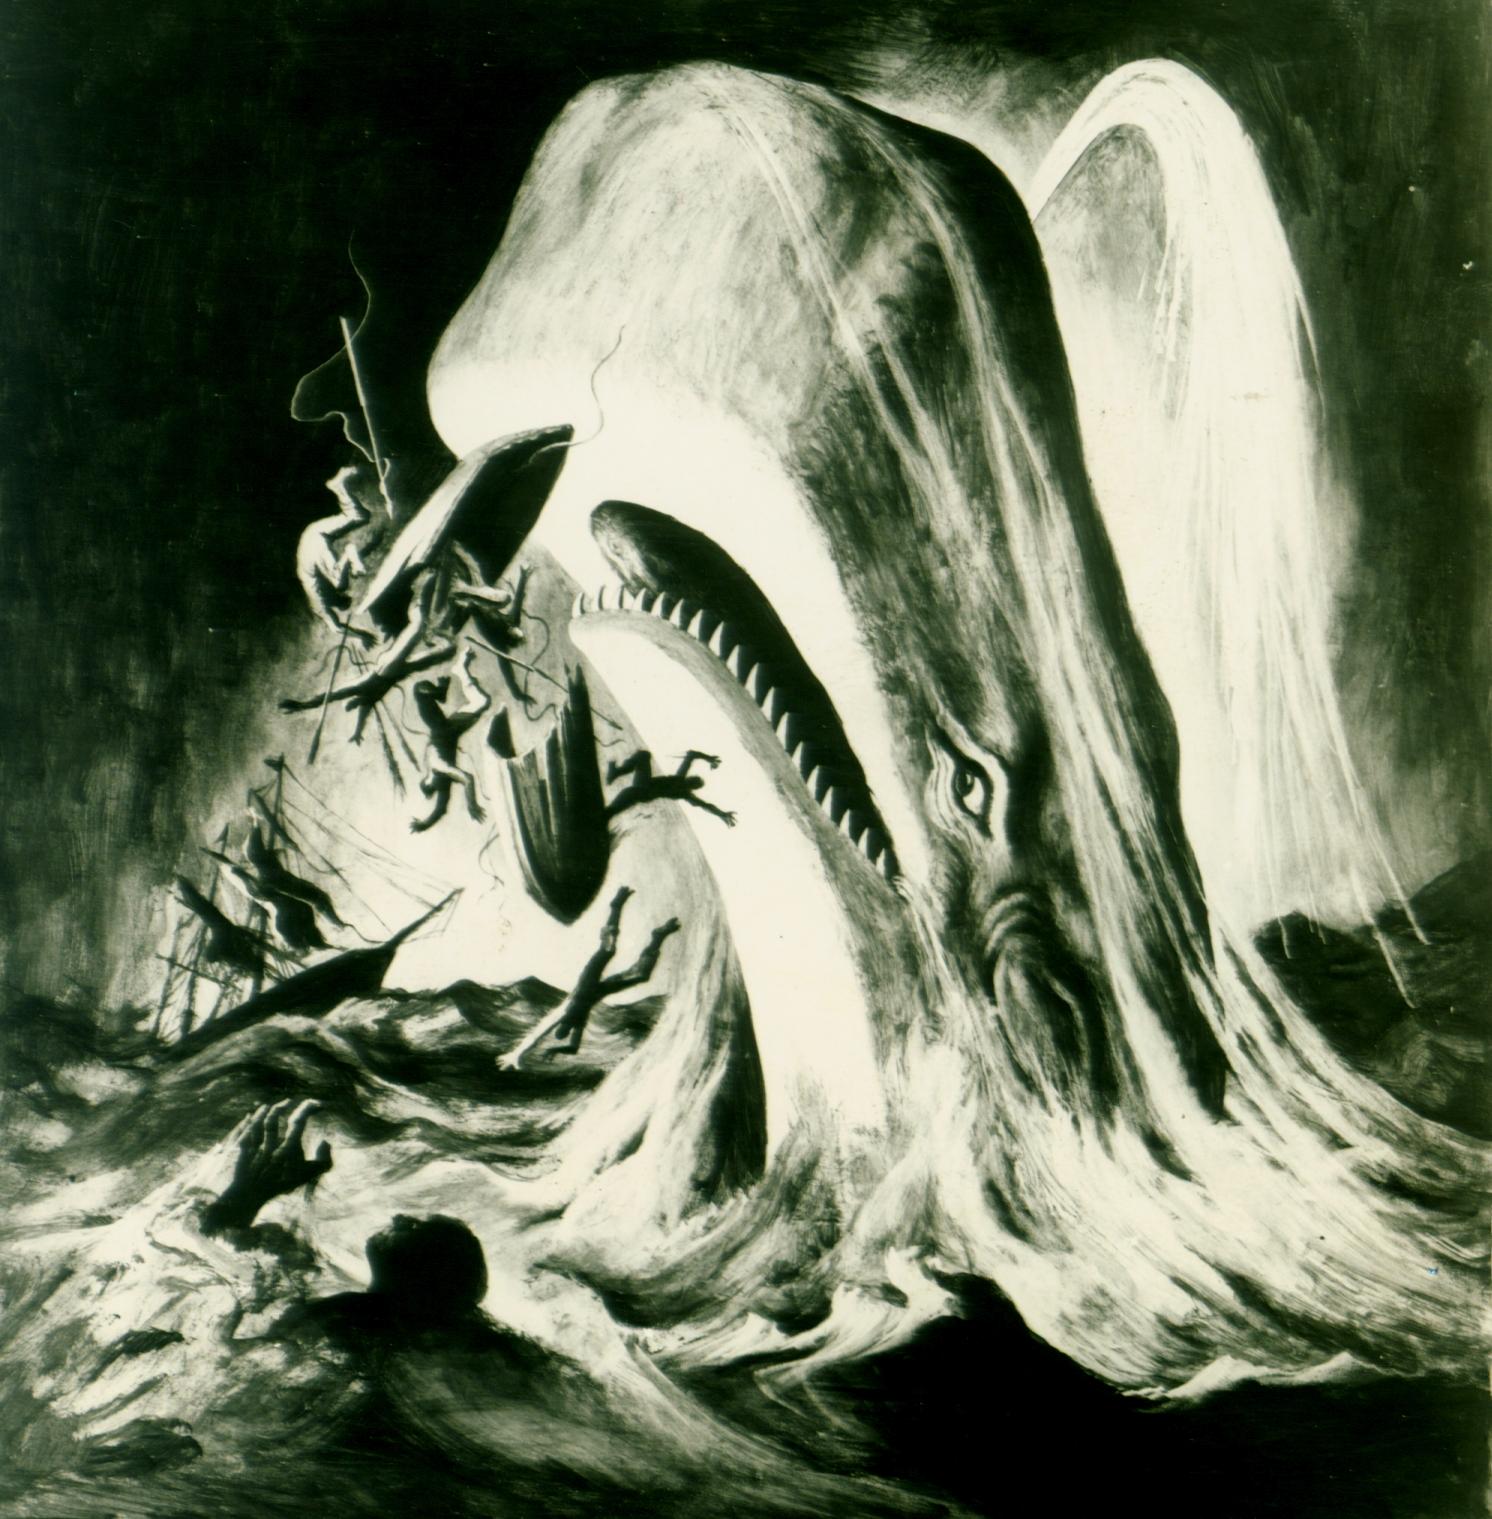 """Moby Dick"" starring Gregory Peck (Warner Bros.)"